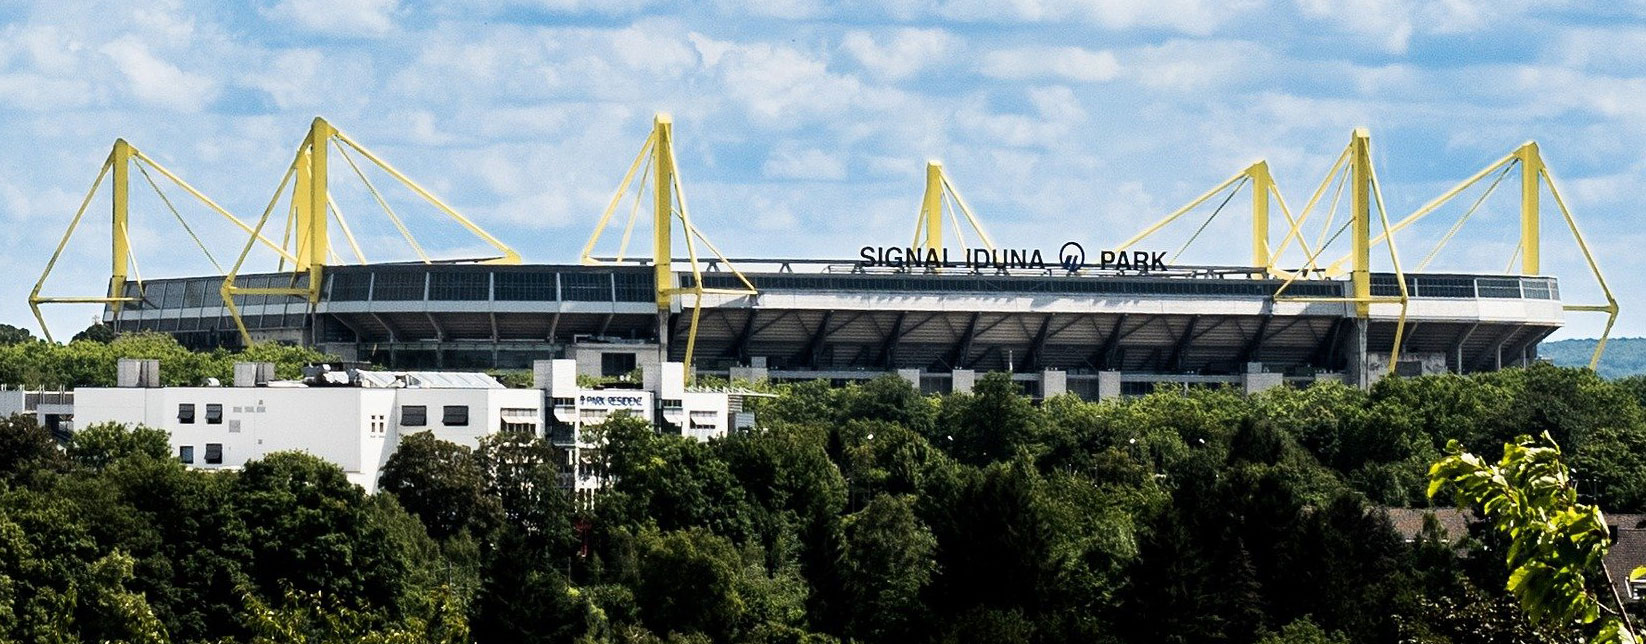 Bild BVB Stadion Signal Iduna Park